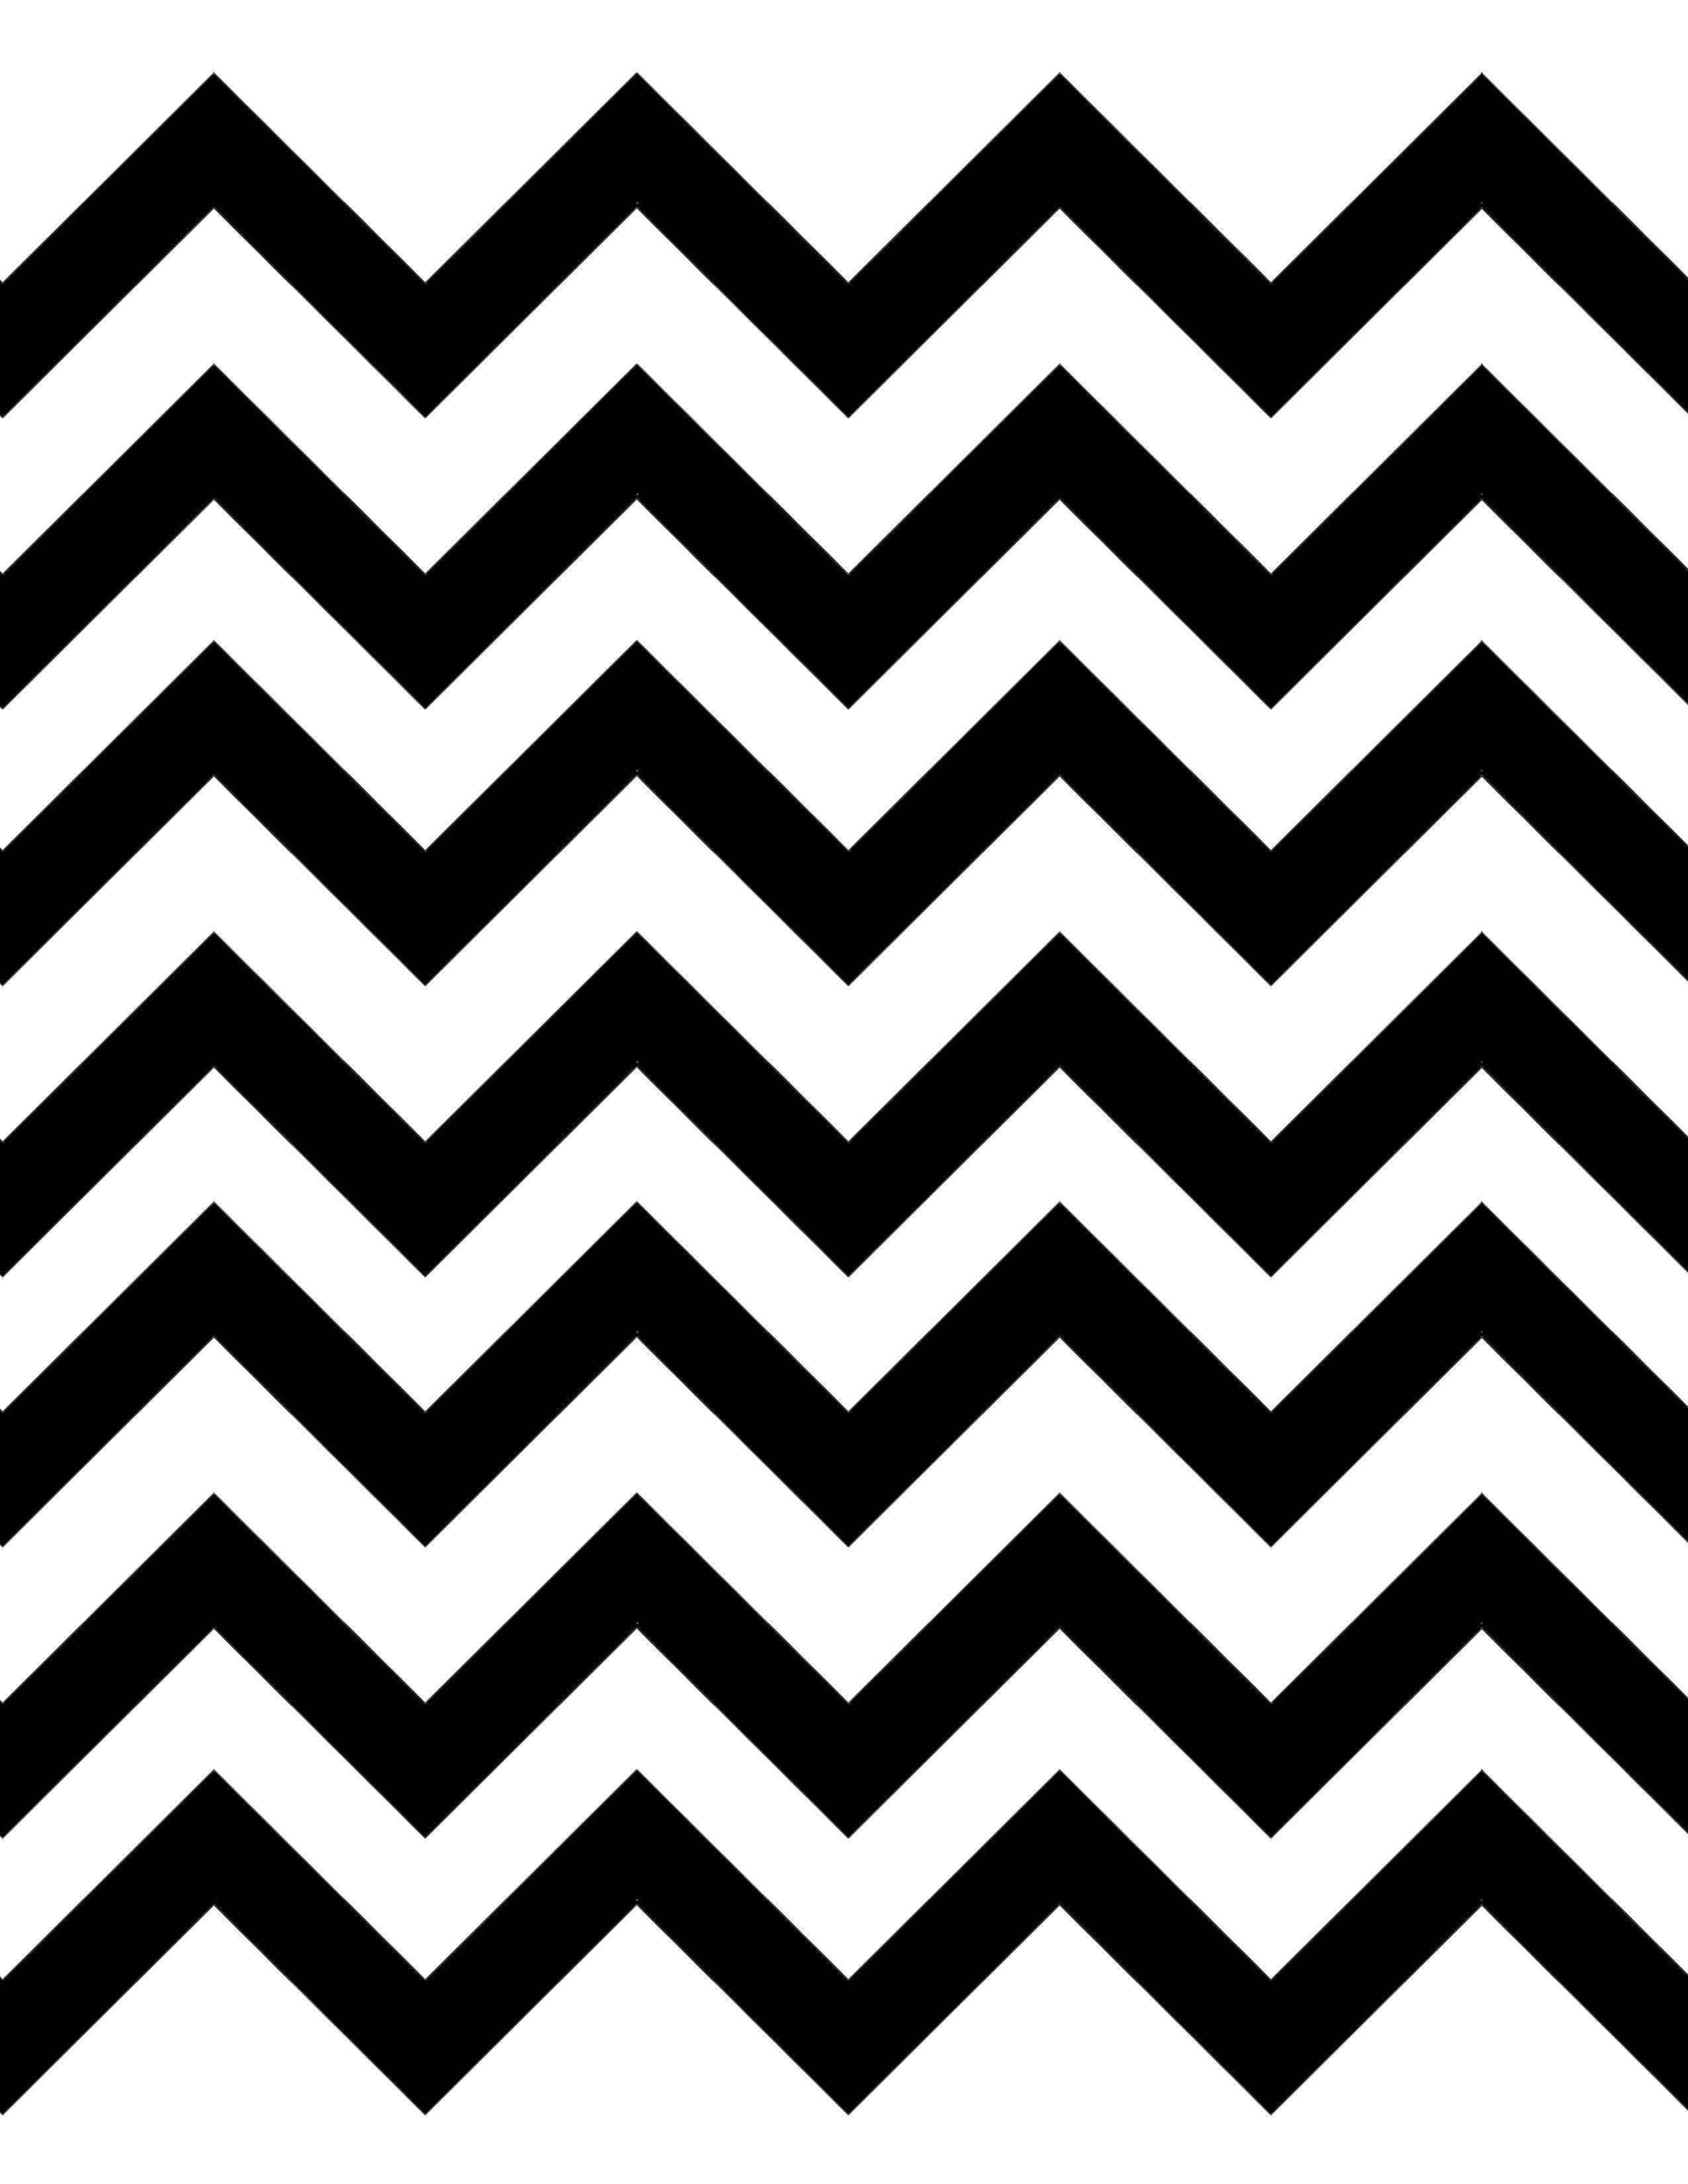 Chevron clipart black and white. Great diy pattern fan